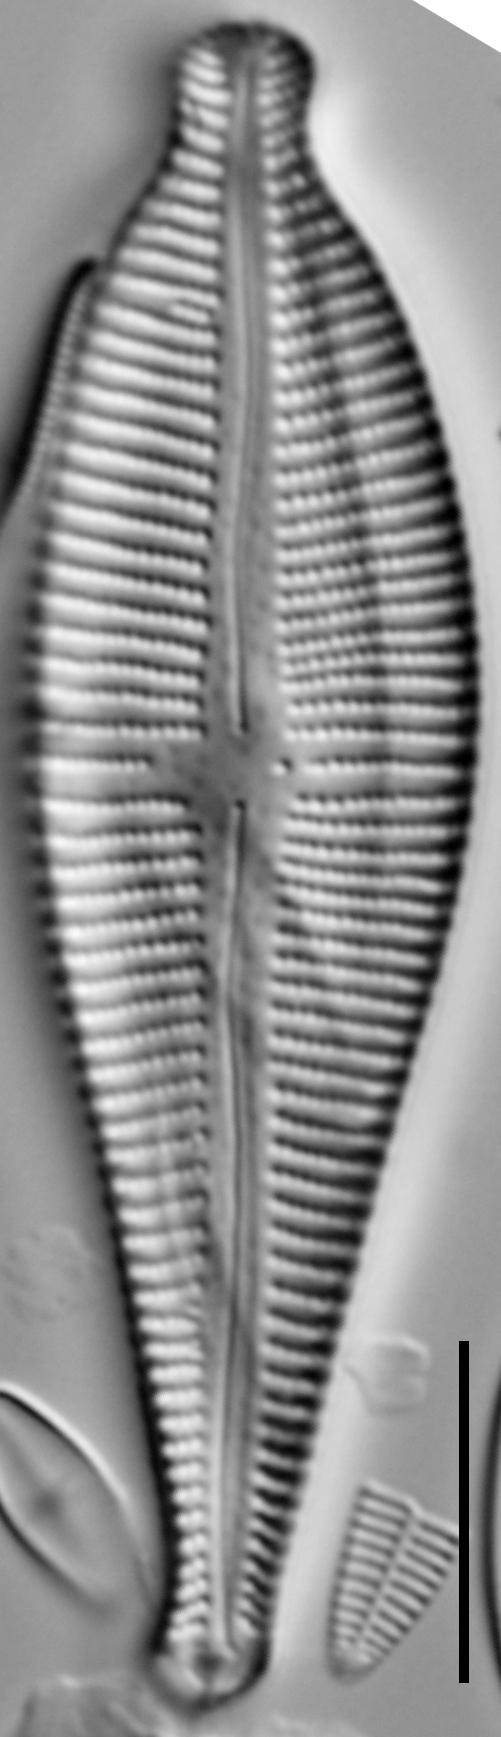 Gomphonema sphaerophorum LM6